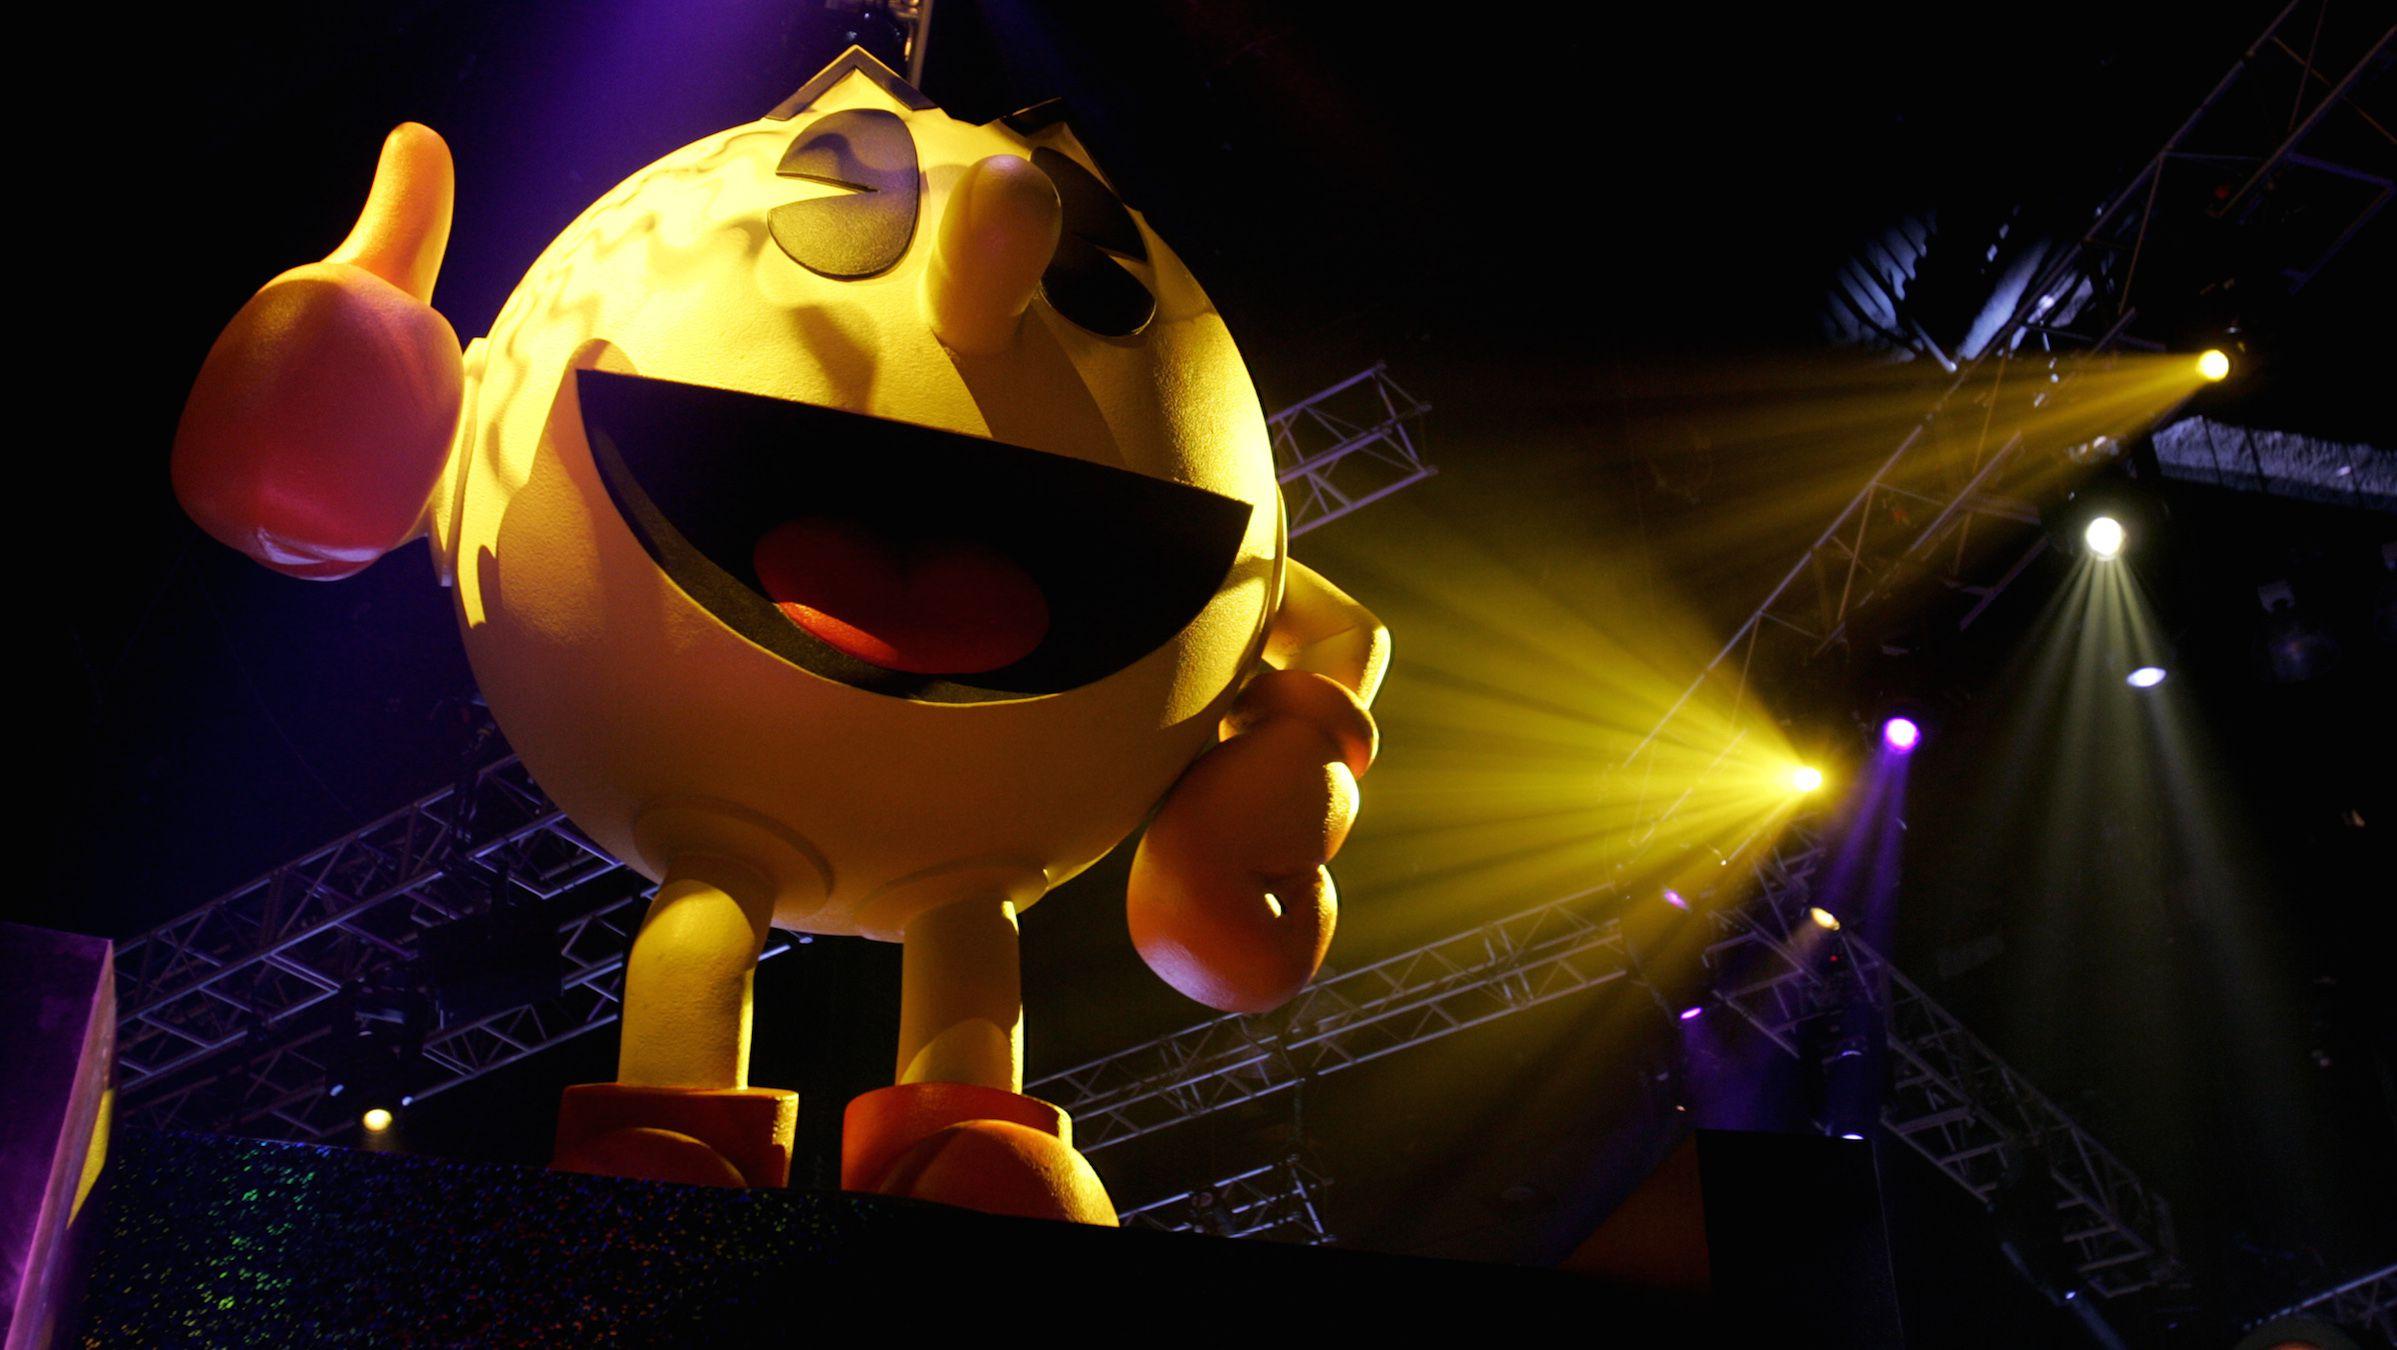 Pac-Man adorns Namco display at the E3 Expo in Los Angeles.